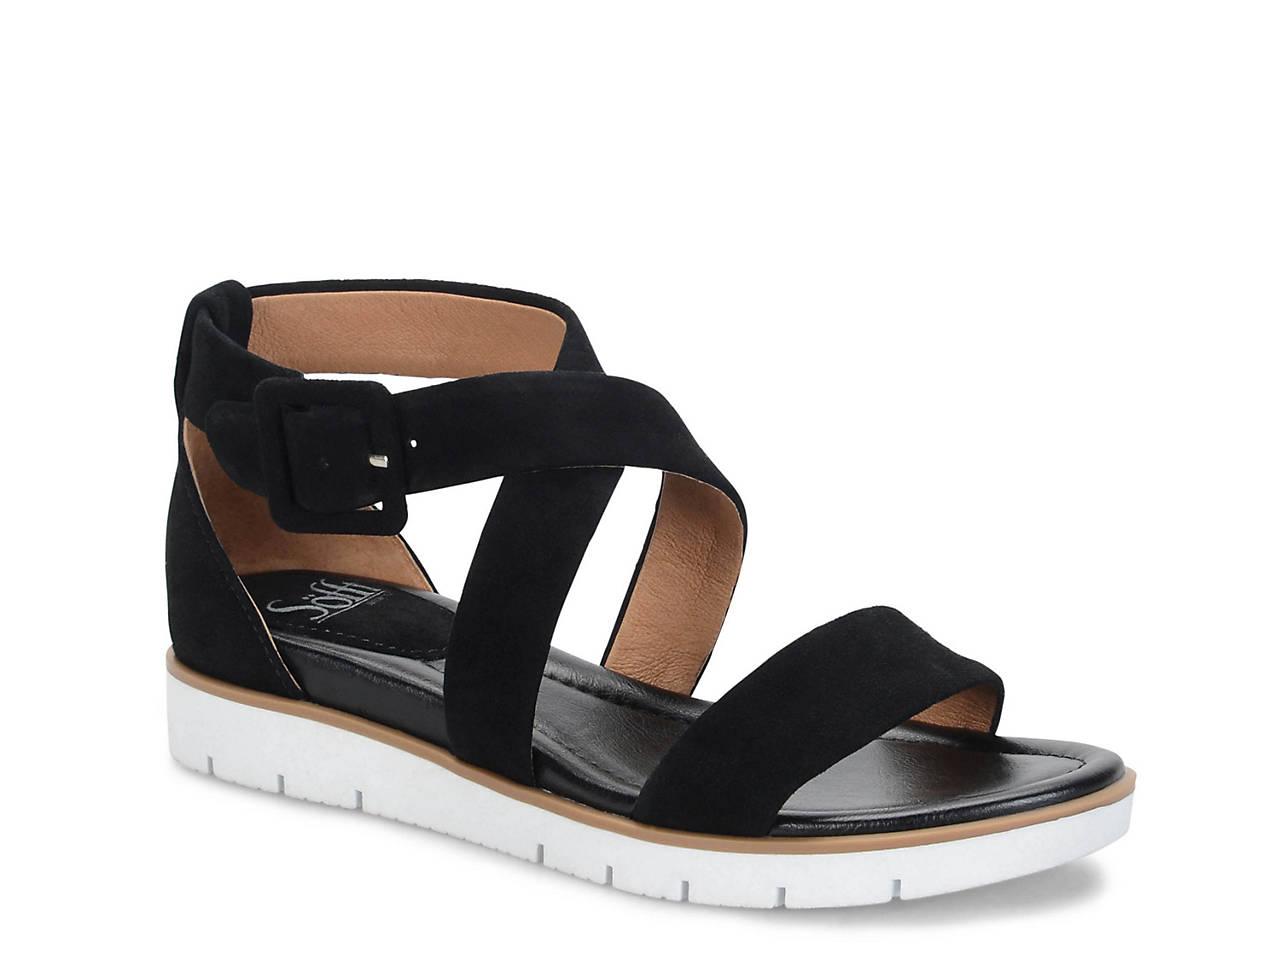 2a1a080db770 Sofft Mira Sandal Women s Shoes